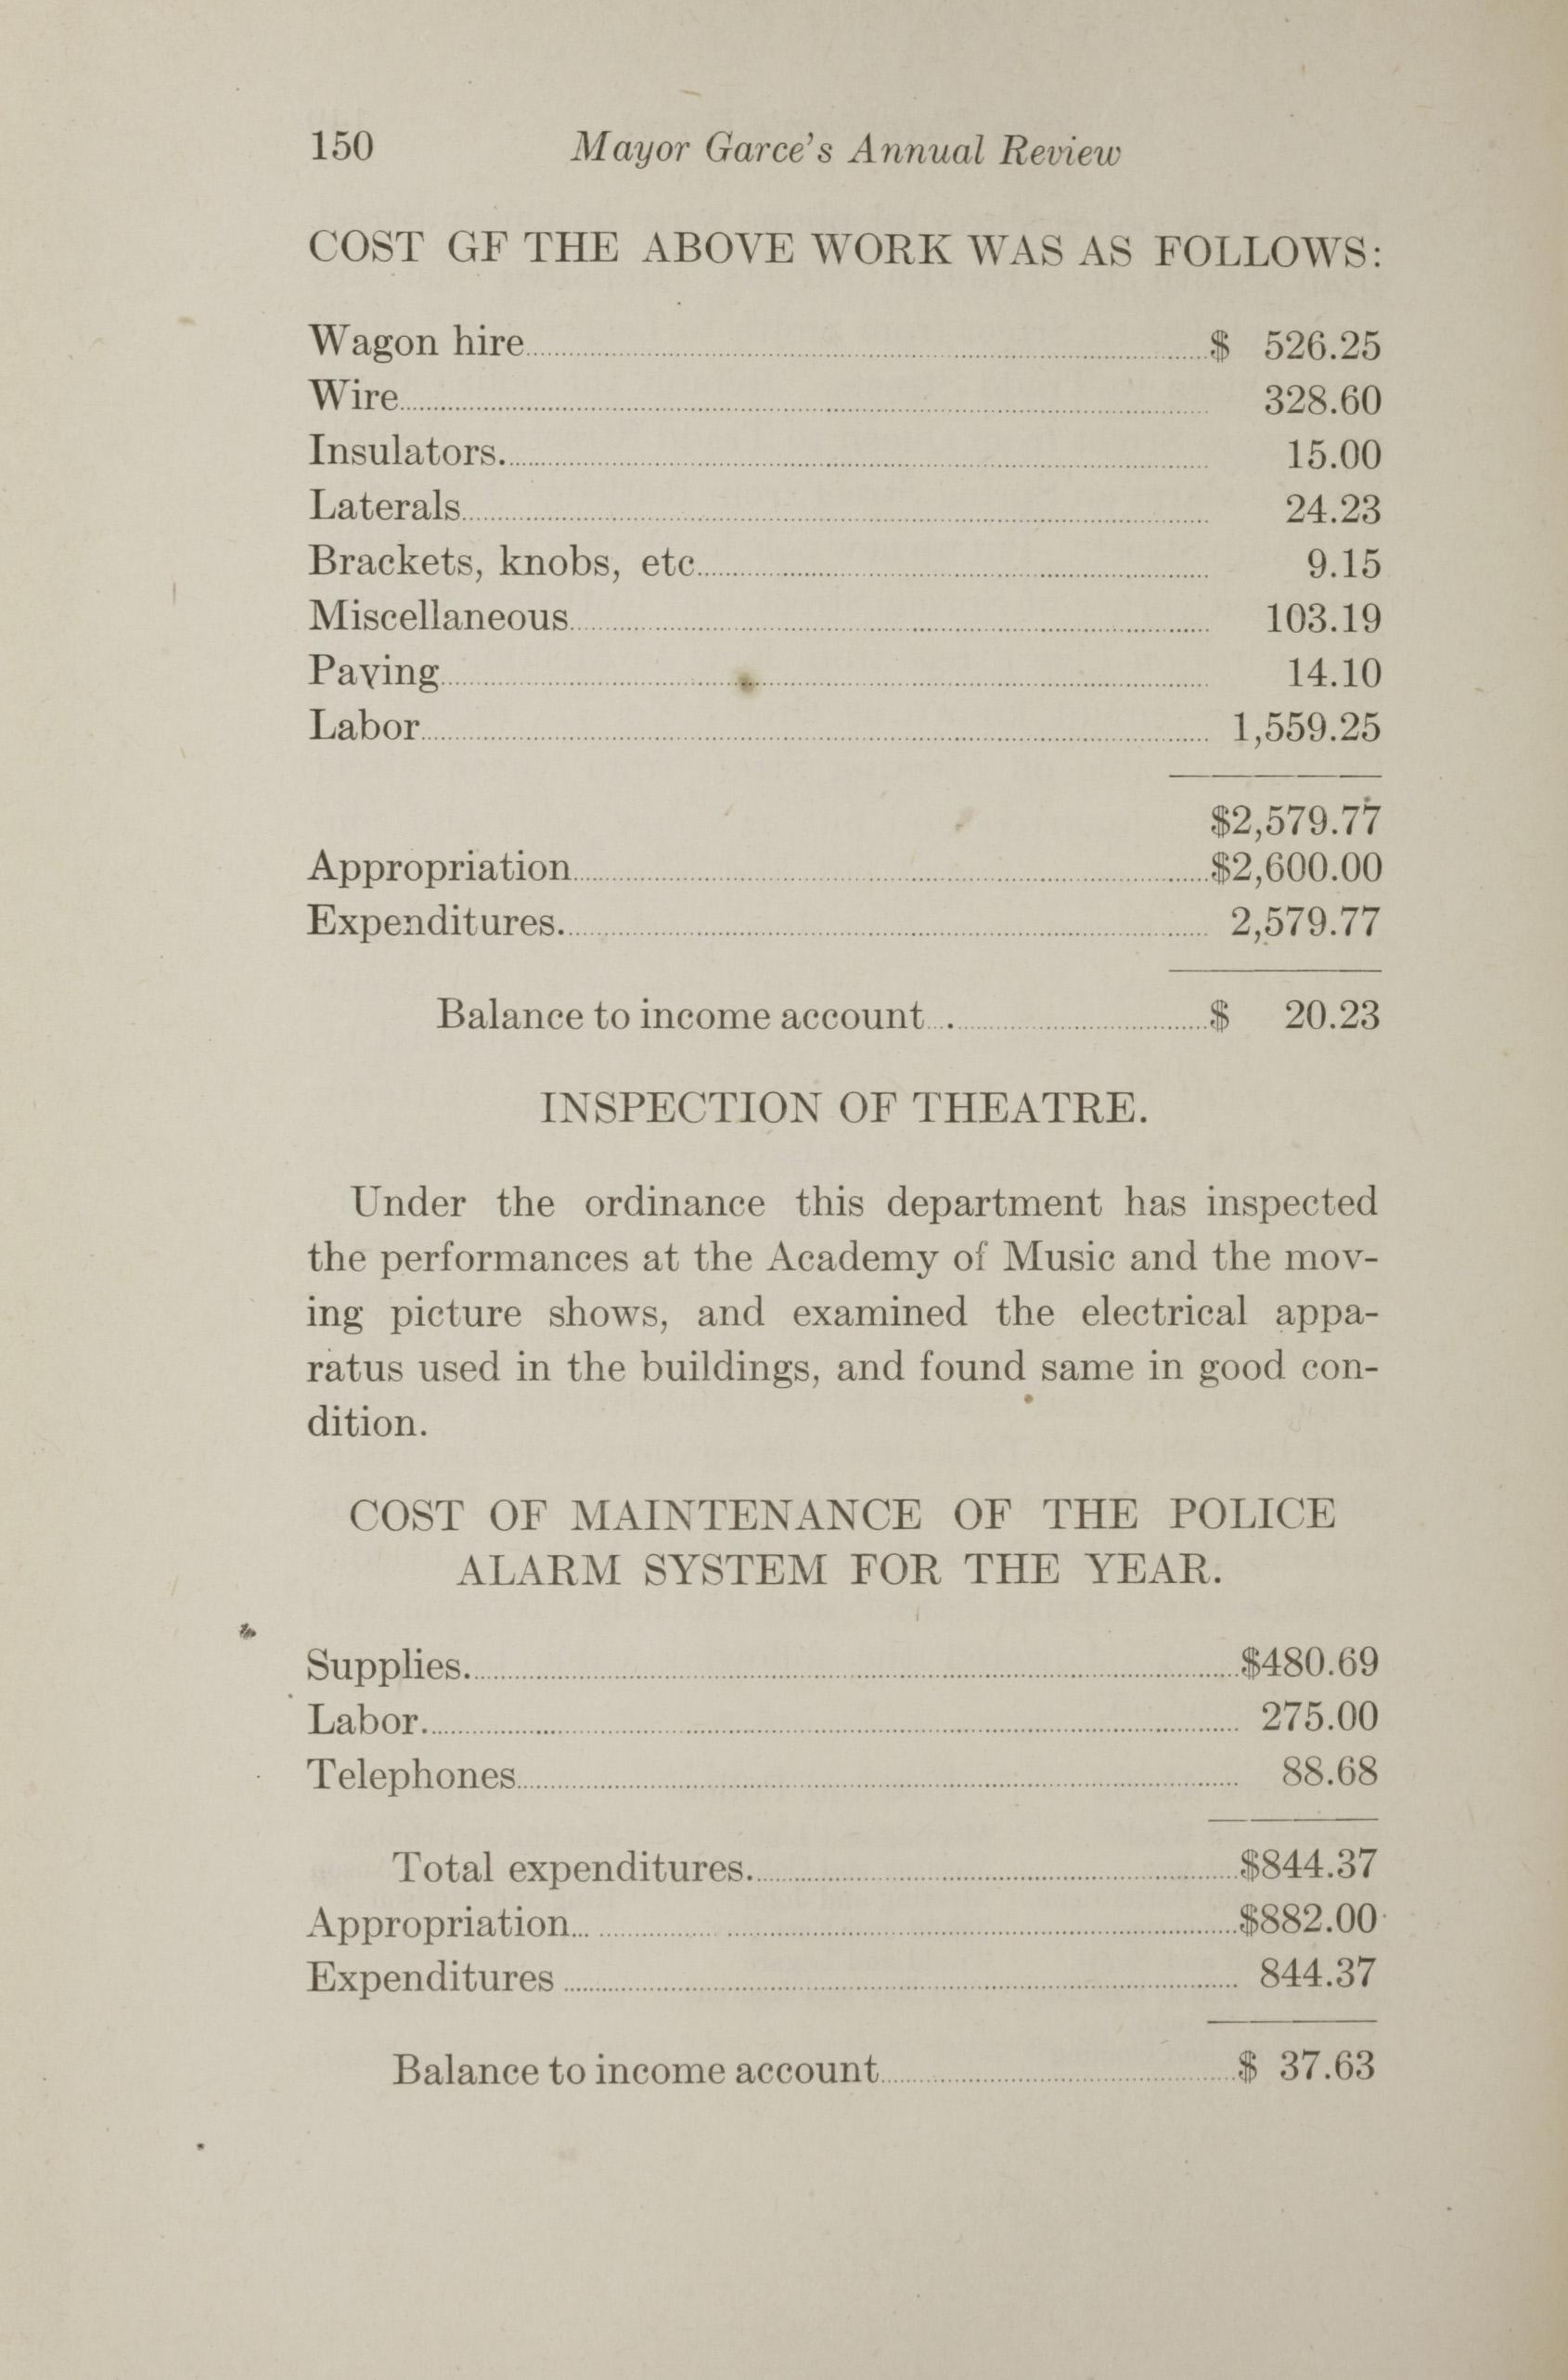 Charleston Yearbook, 1912, page 150